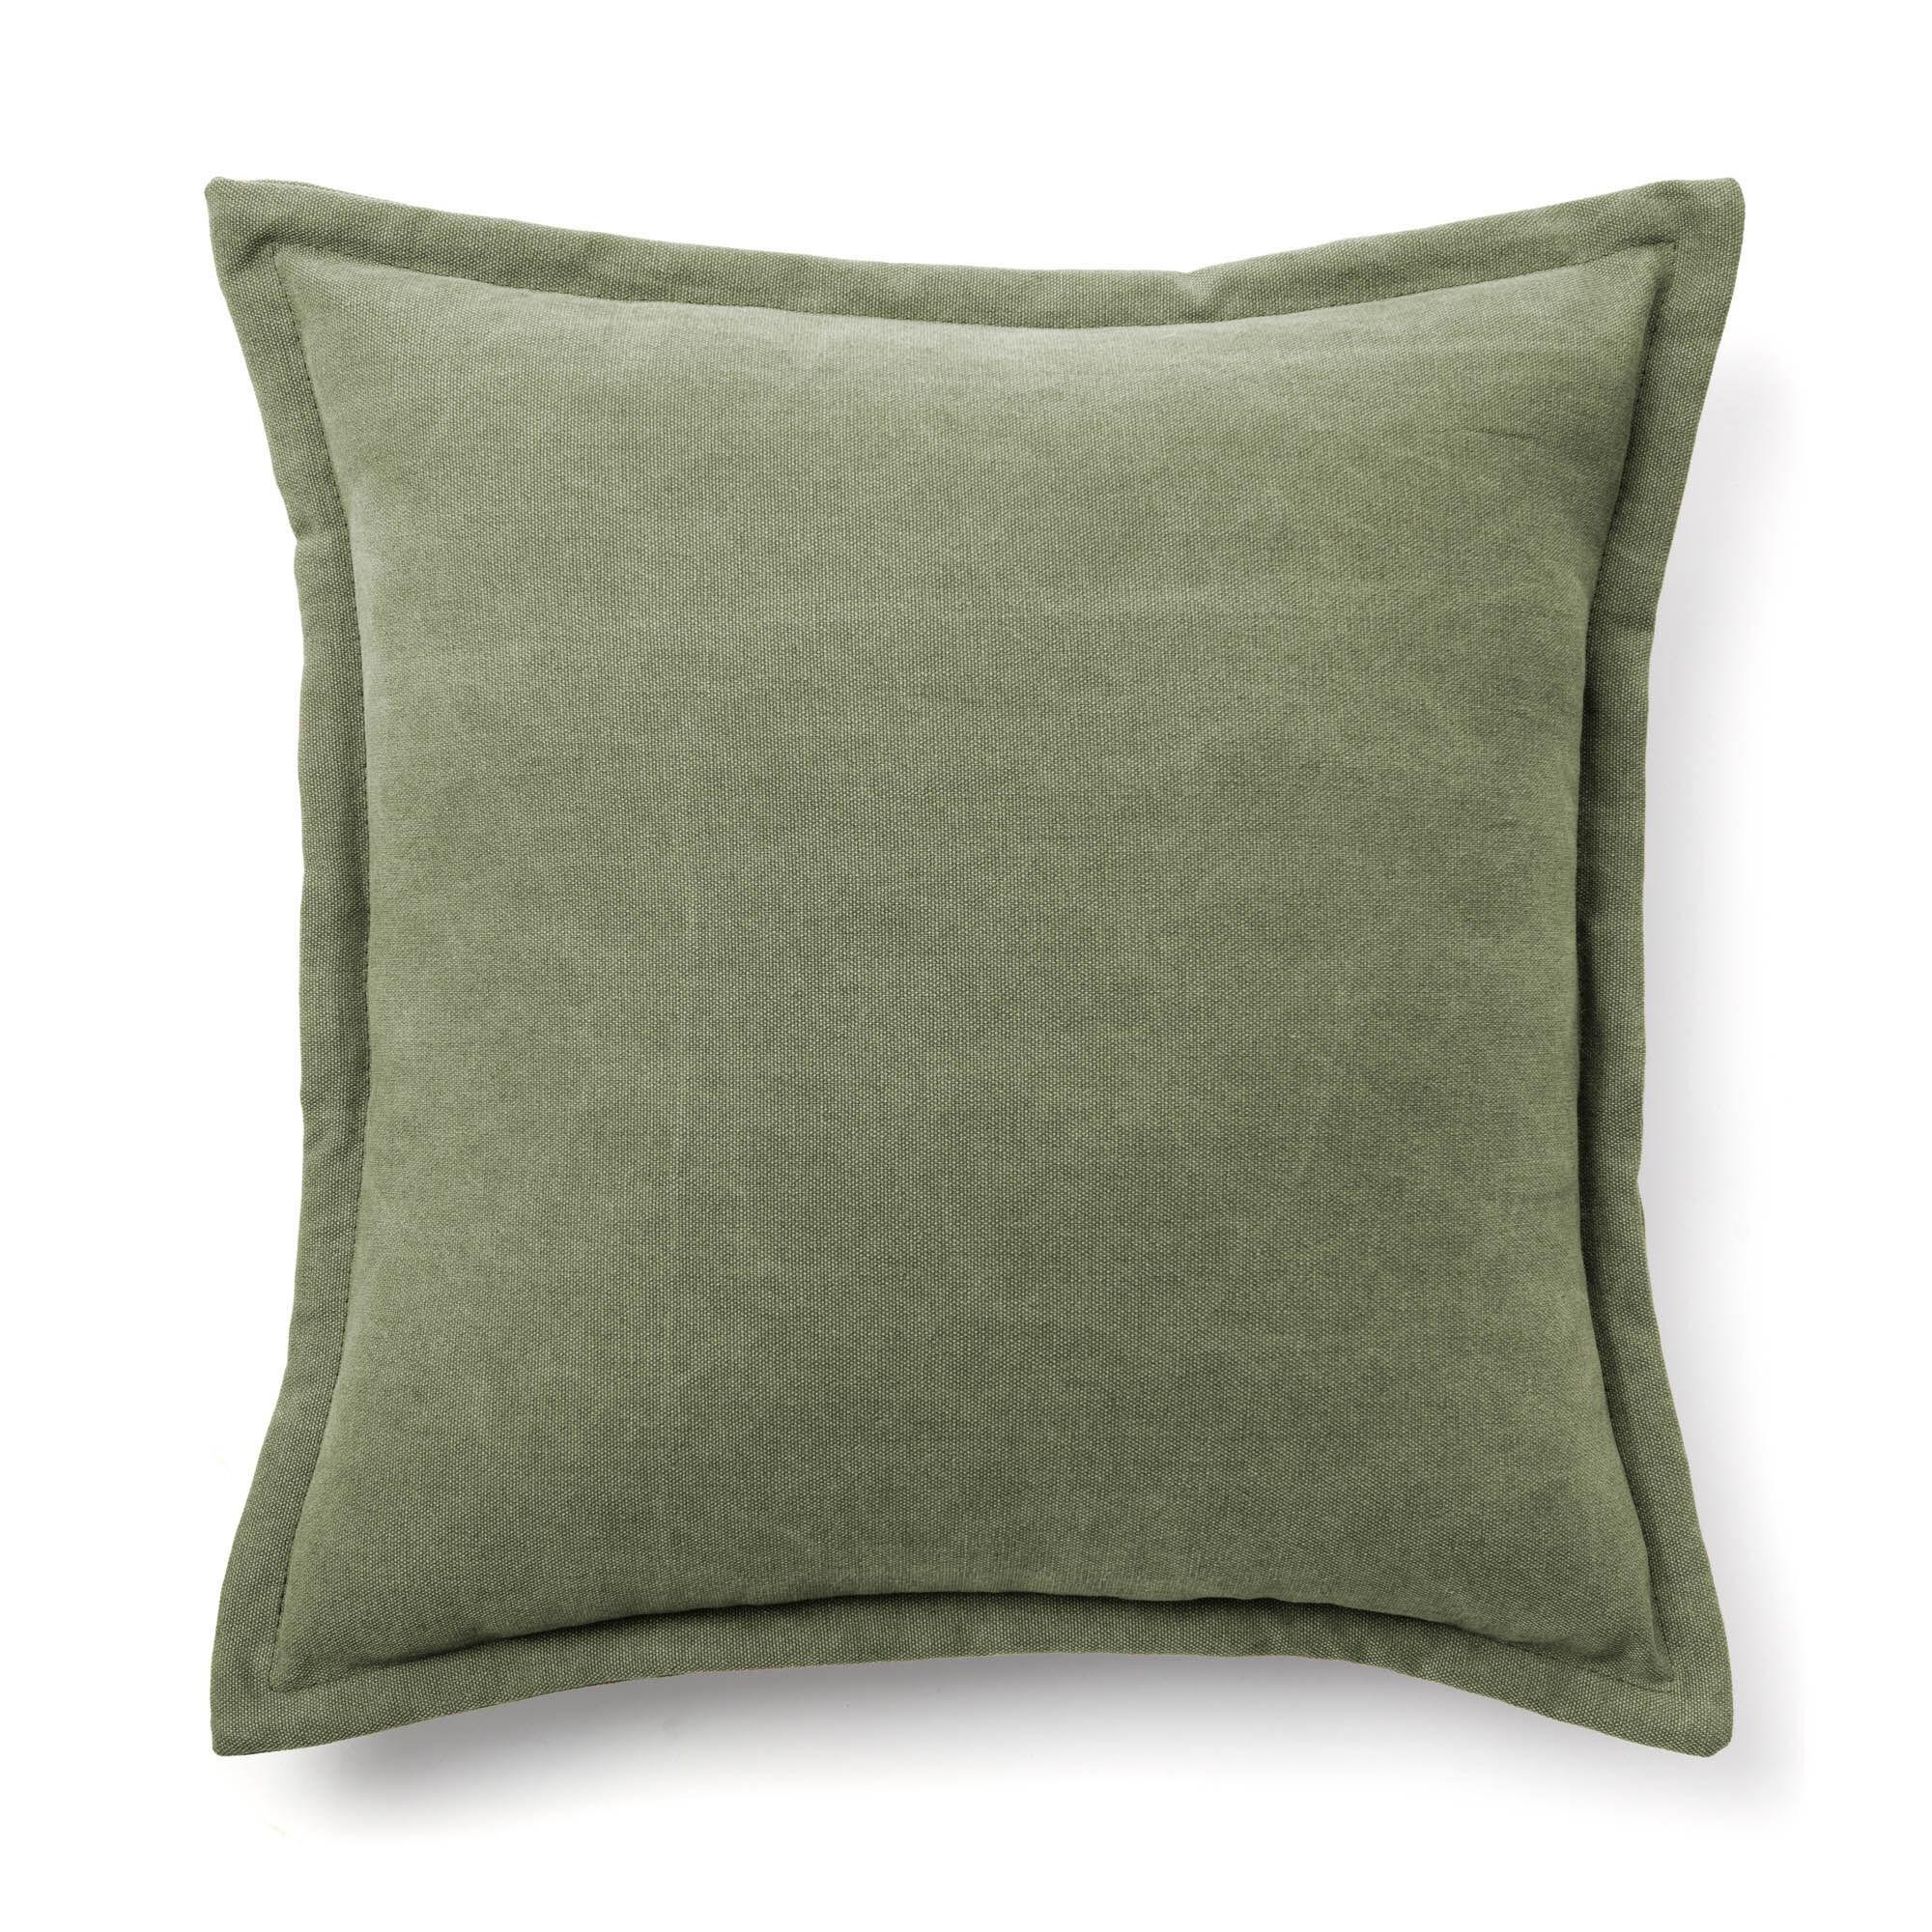 Kave Home Fodera per cuscino Lisette 45 x 45 cm verde